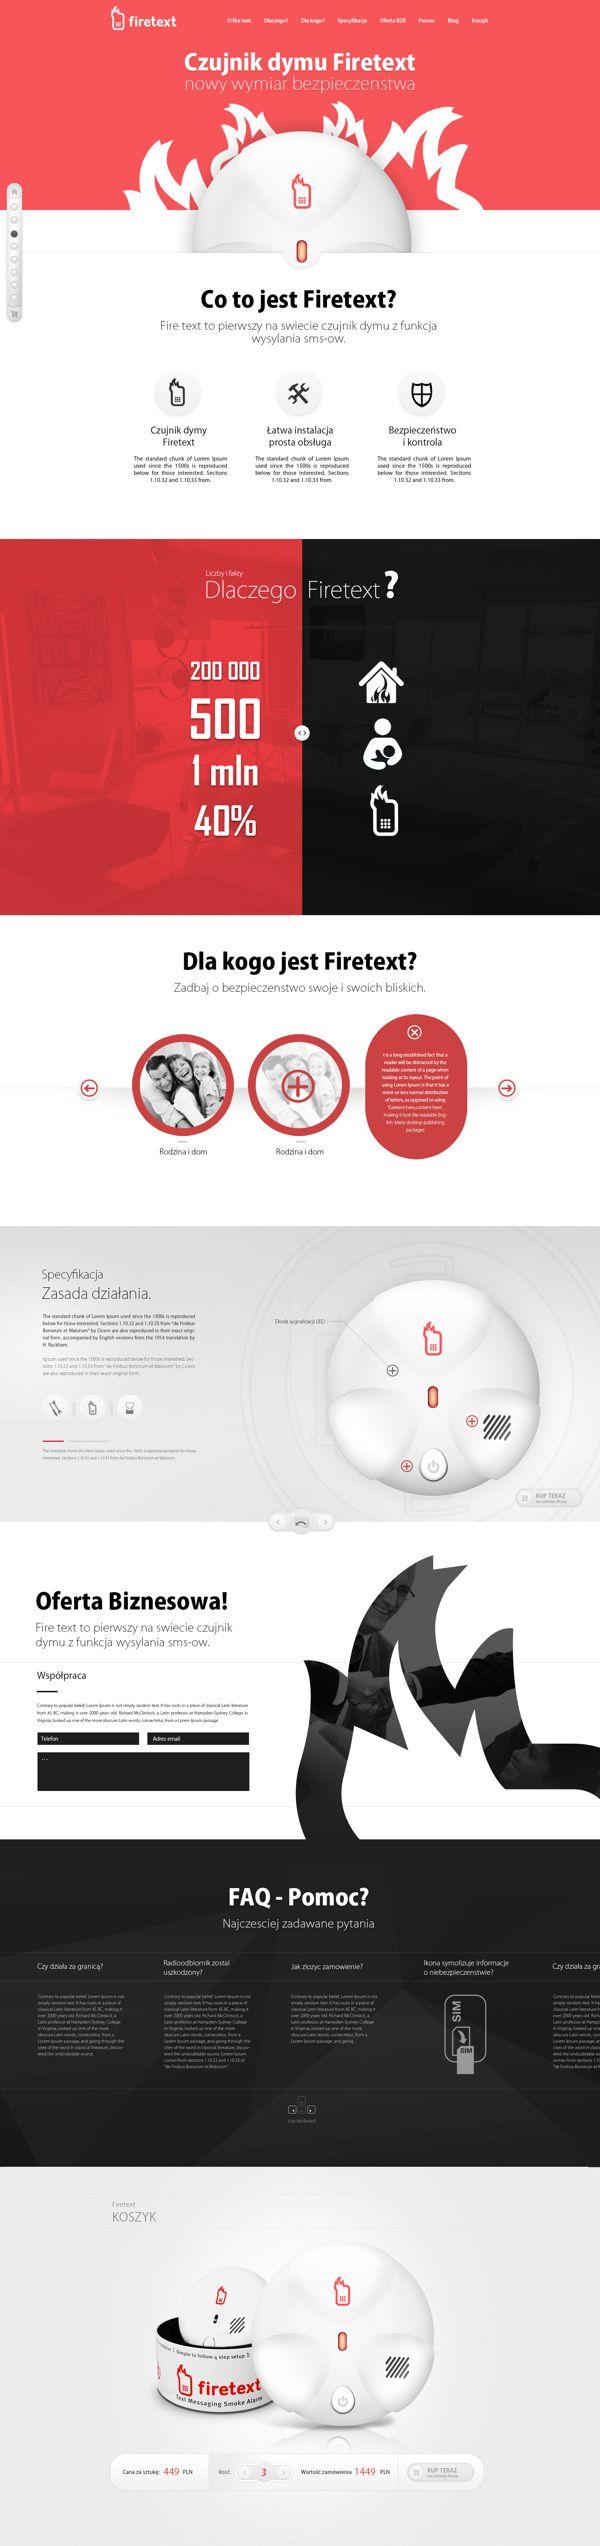 Fire Text   #webdesign #it #web #design #layout #userinterface #website #webdesign < repinned by www.BlickeDeeler.de   Take a look at www.WebsiteDesign-Hamburg.de